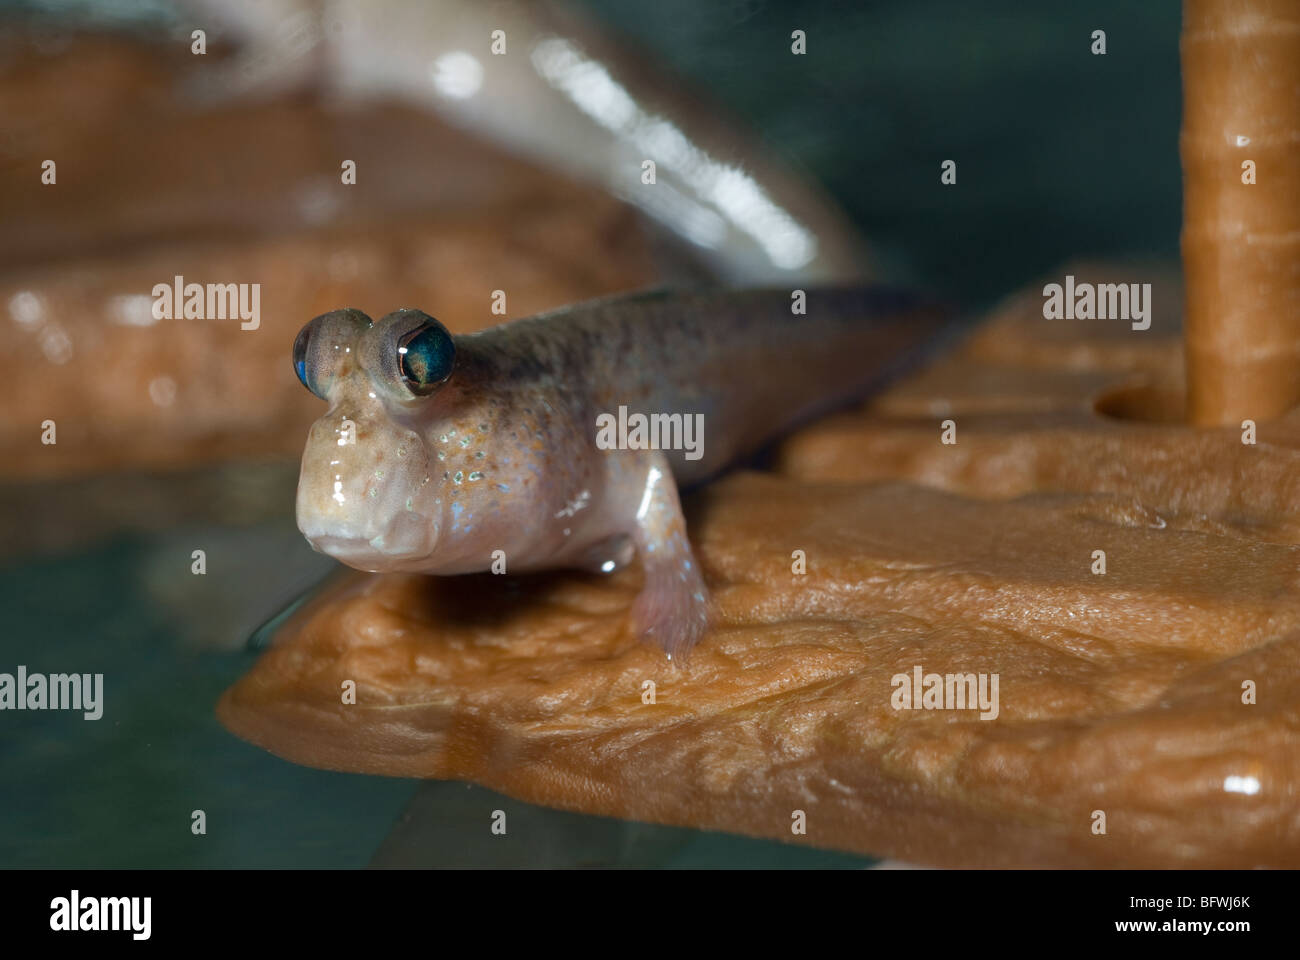 Periophthalmus Mudskipper sp., Periophthalmidae, Sudeste Asiático Imagen De Stock